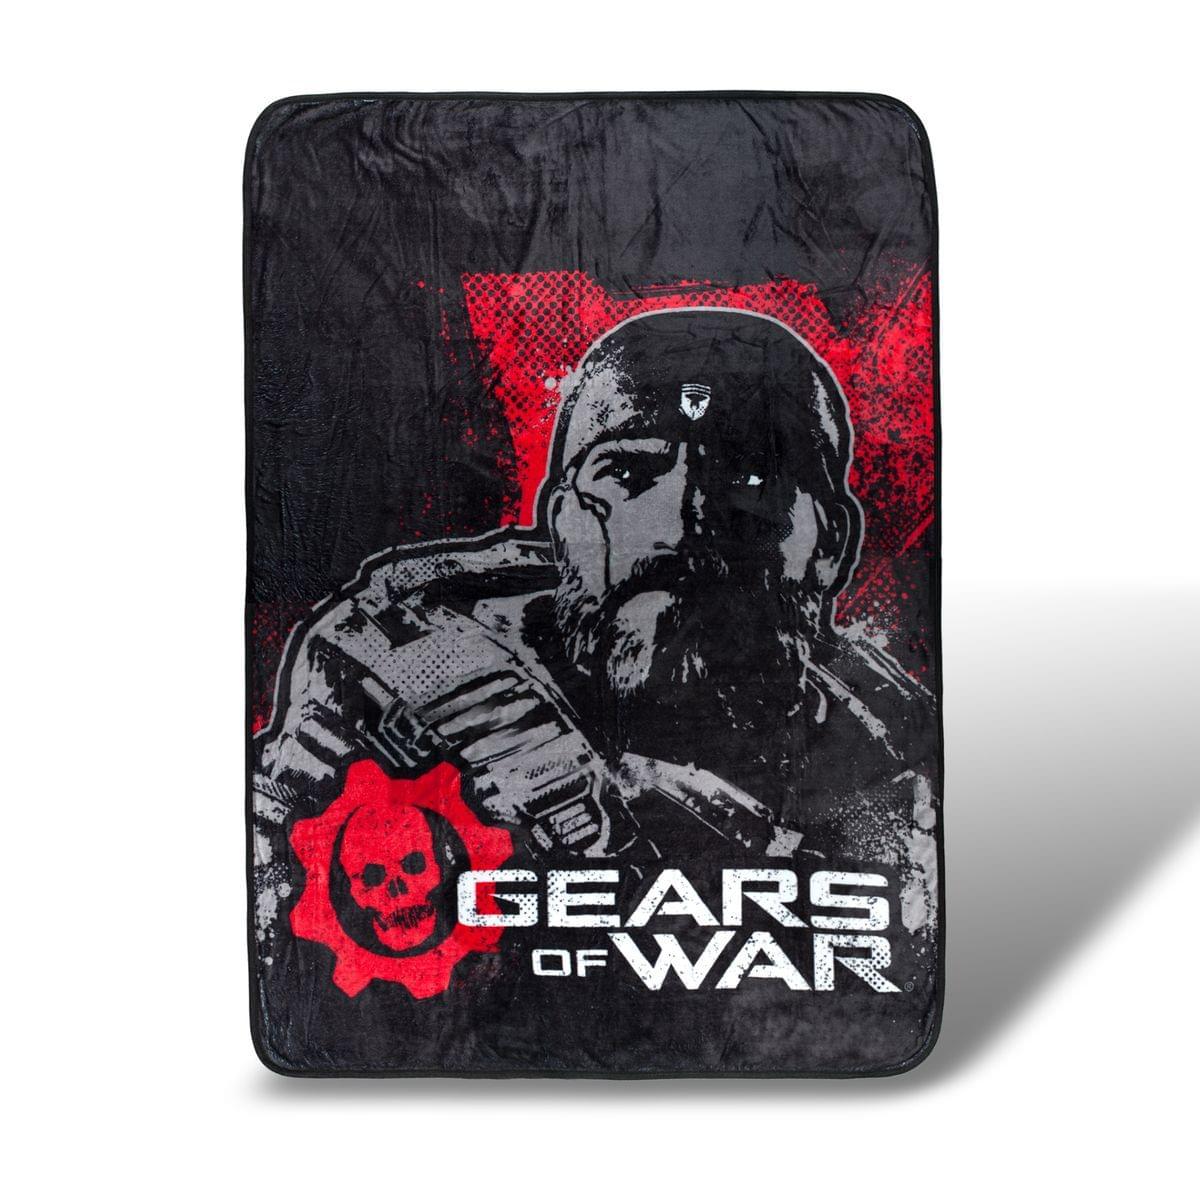 Gears Of War Lightweight Fleece Throw Blanket | 45 x 60 Inches